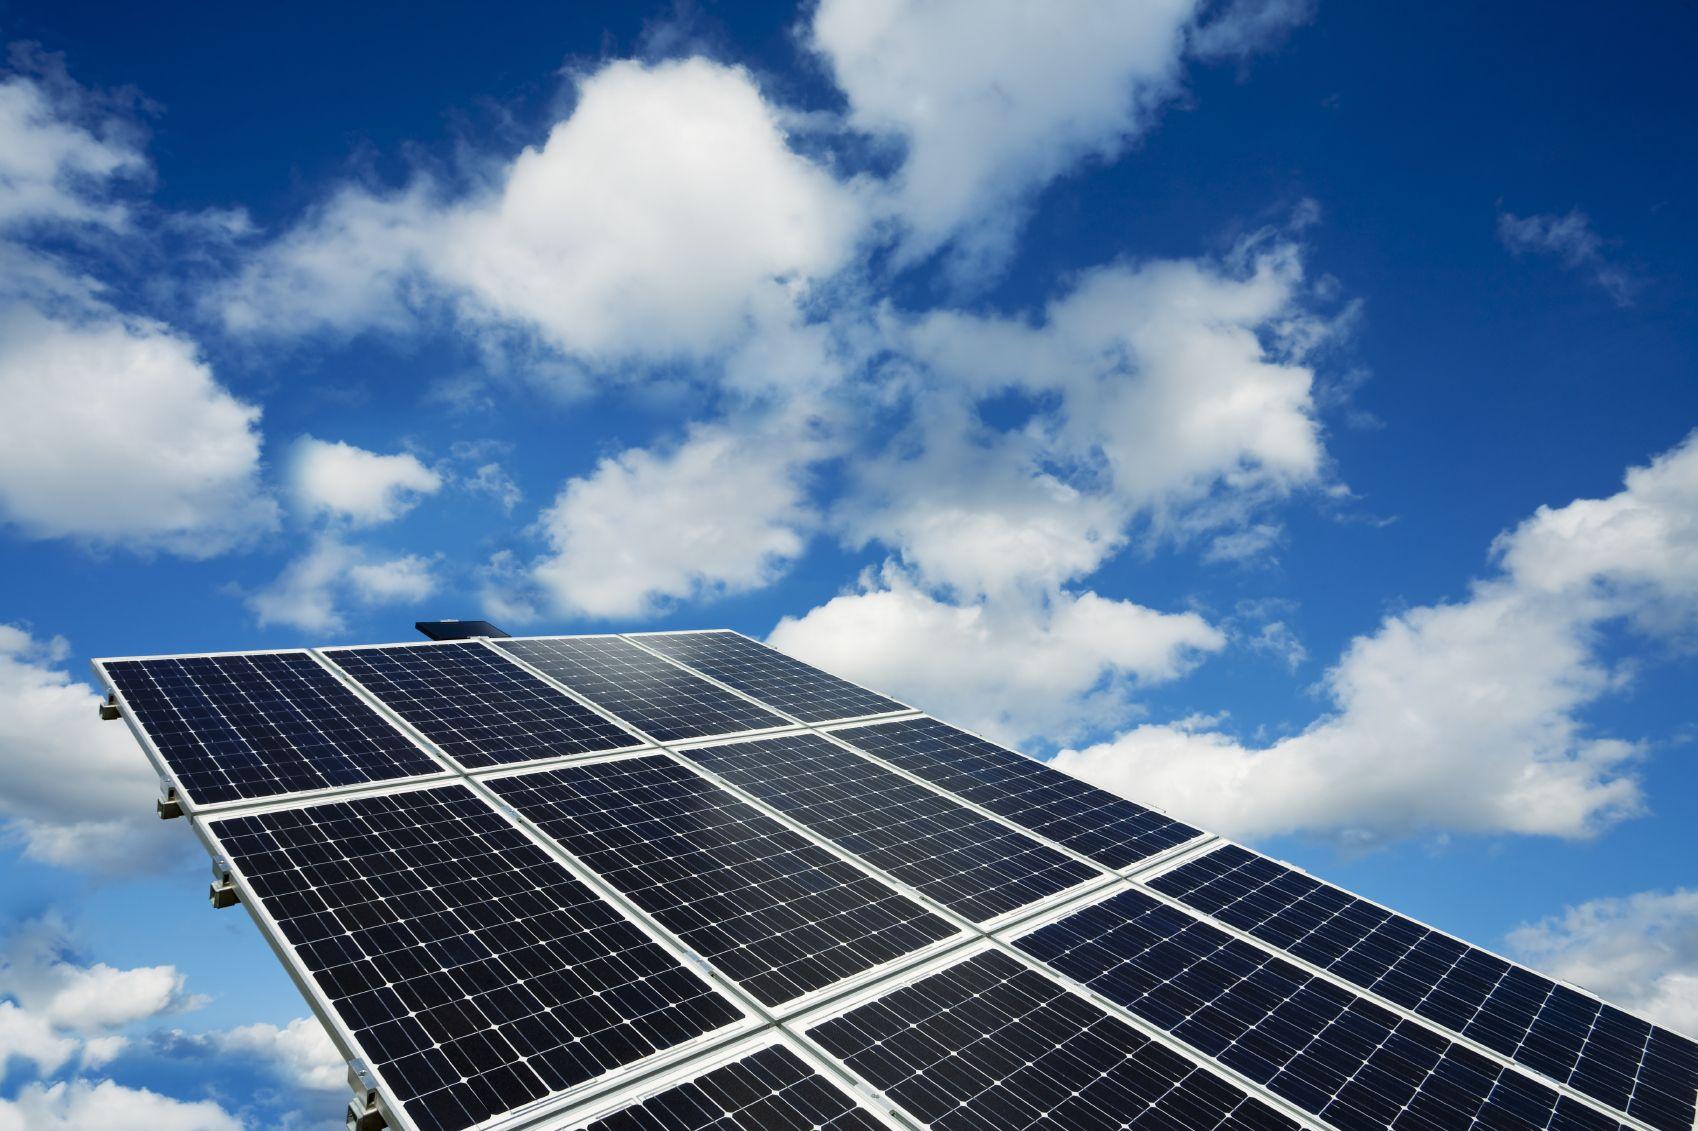 Kinds Of Solar Panels Solar Panels Solar Power House Best Solar Panels